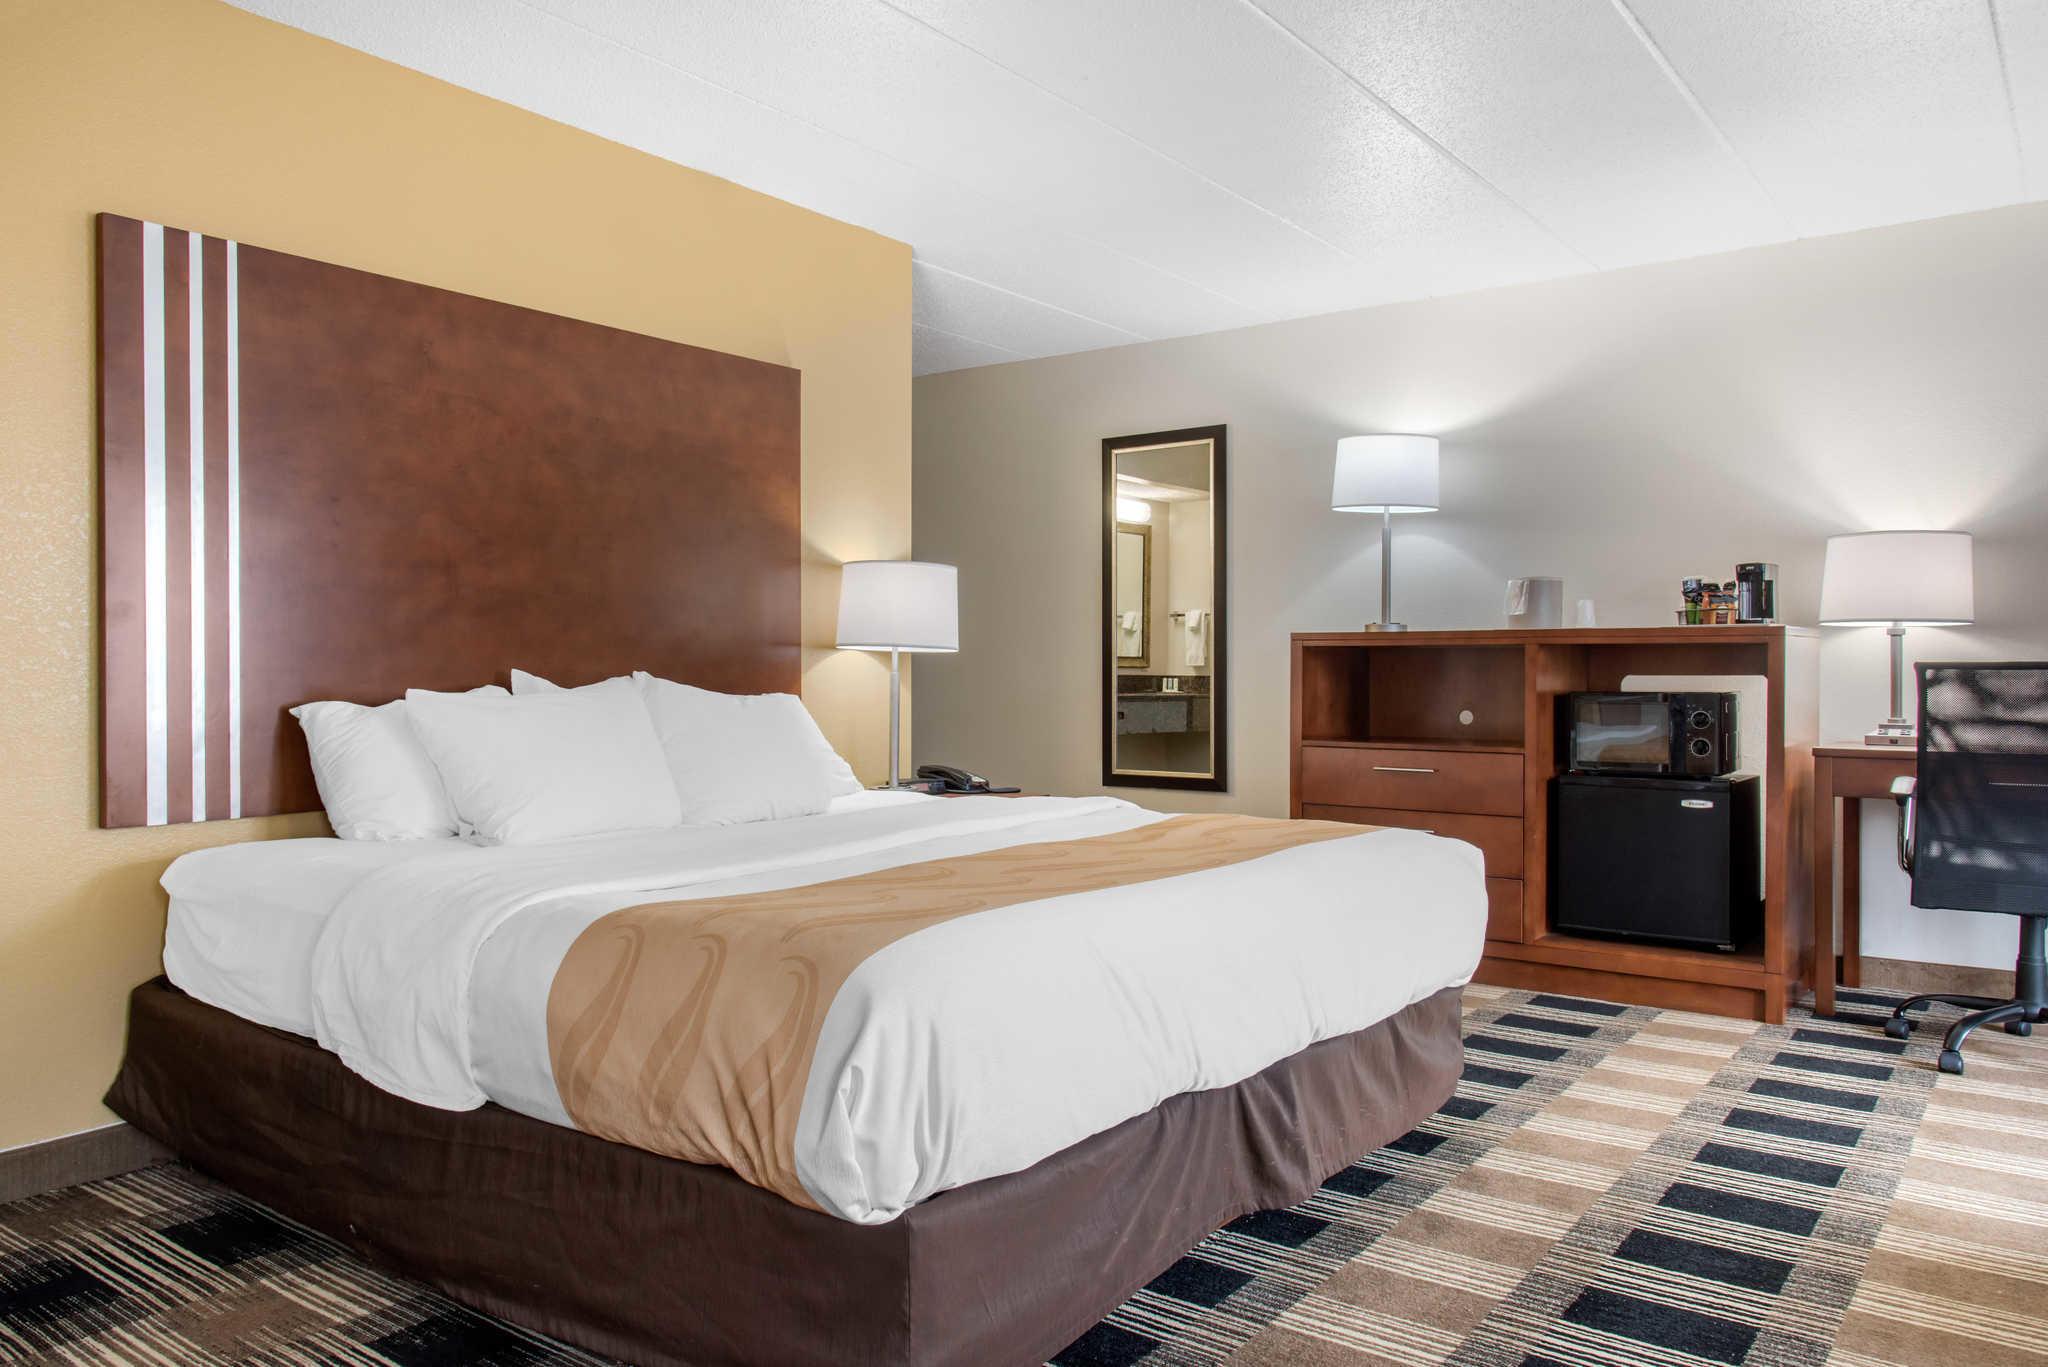 Quality Inn image 39